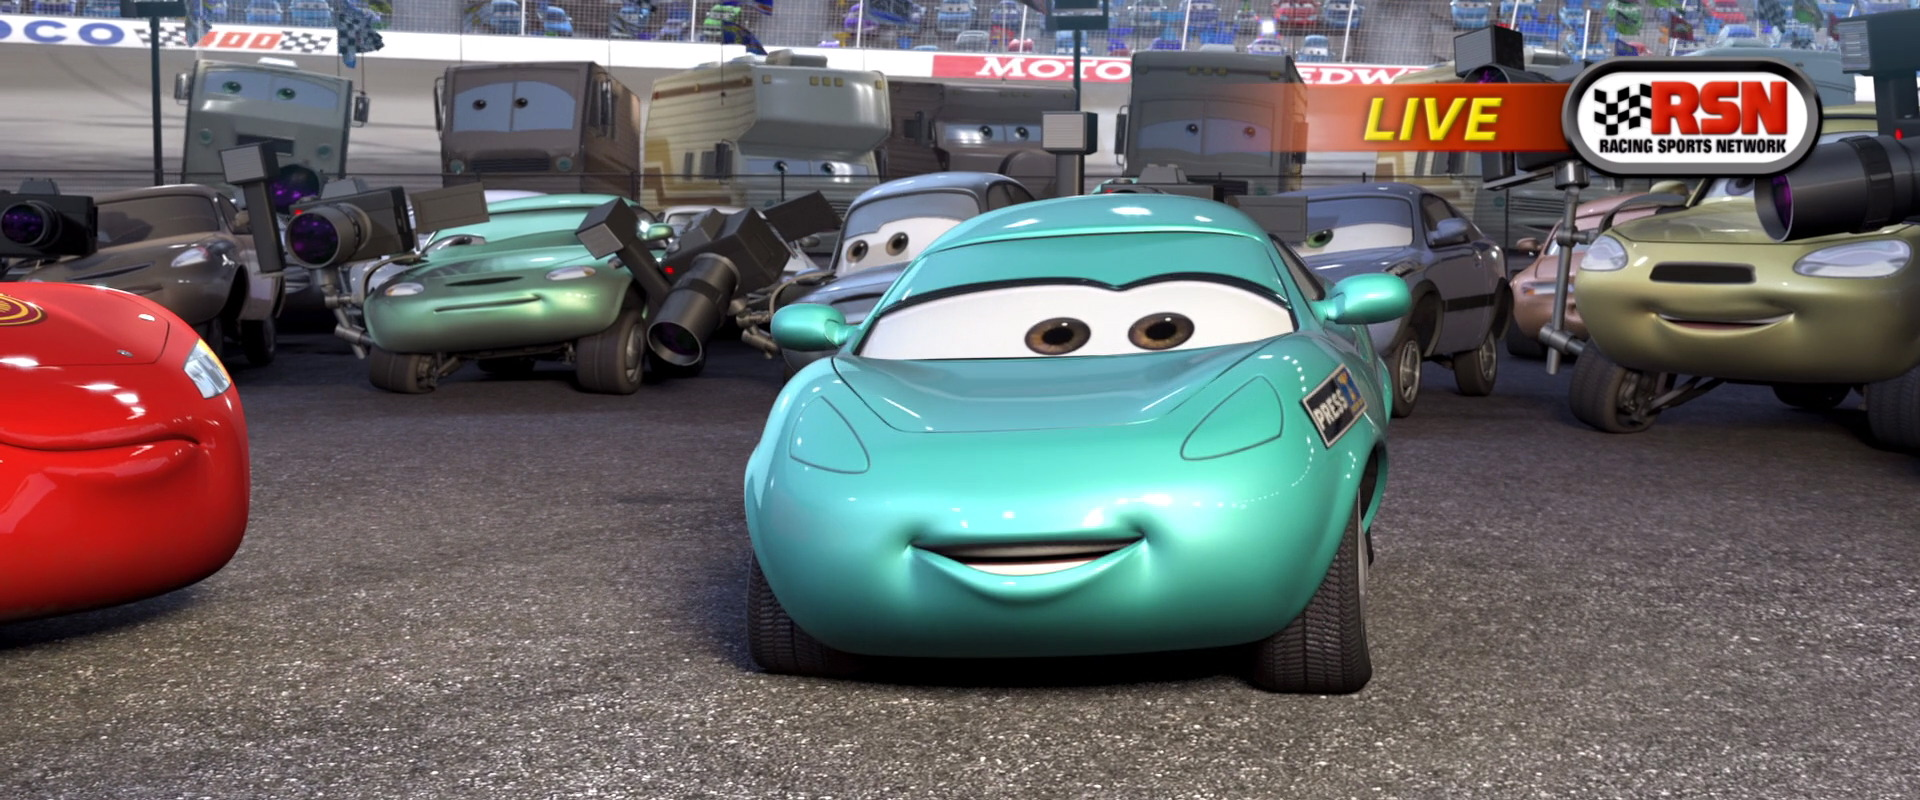 kori turbowitz personnage dans cars pixar planet fr. Black Bedroom Furniture Sets. Home Design Ideas